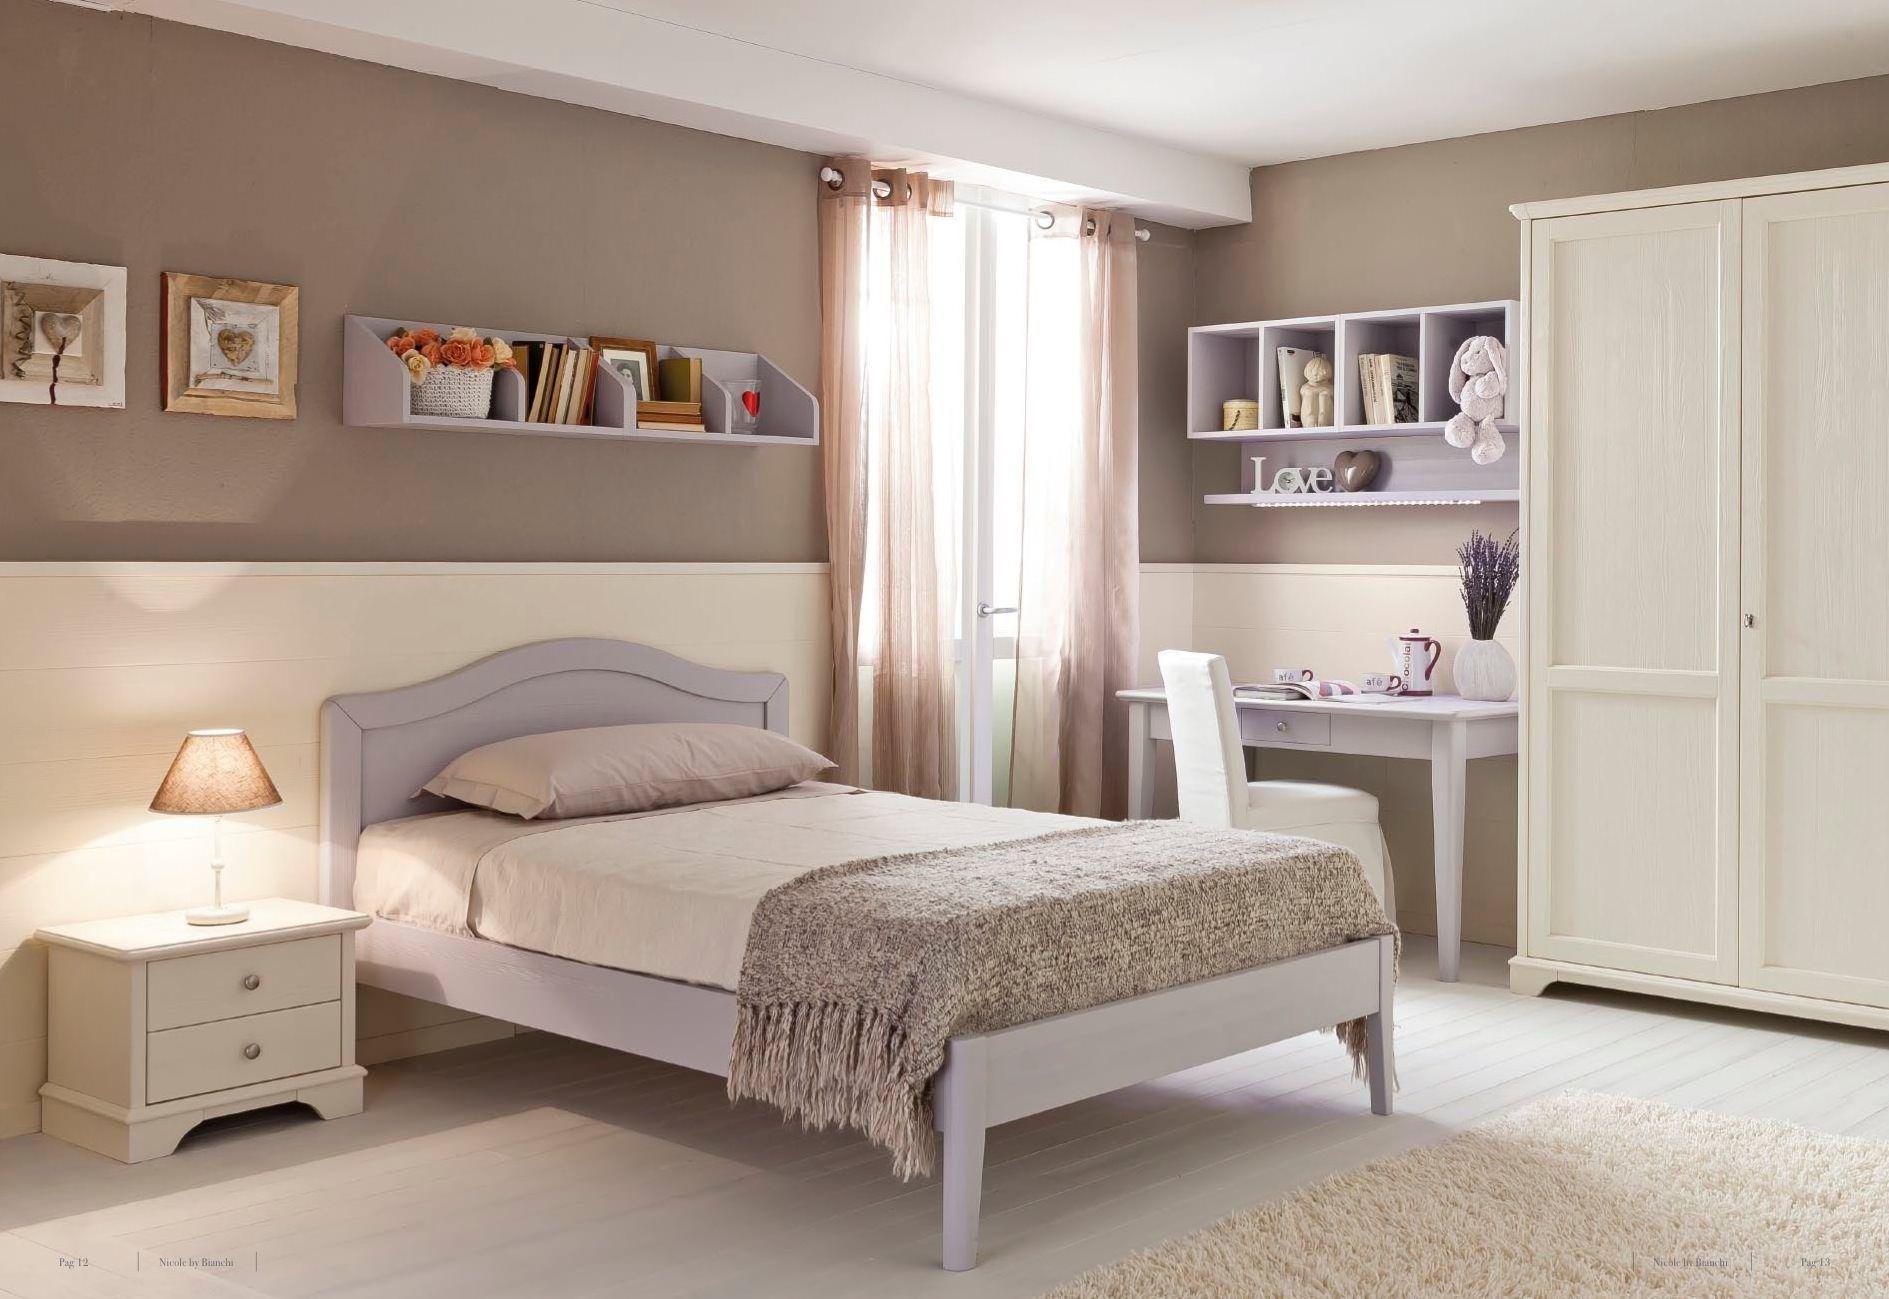 Camerette Stile Shabby Chic.Camerette Stile Country Chic Cameretta Country Classica Letti Home Furniture Home Decor